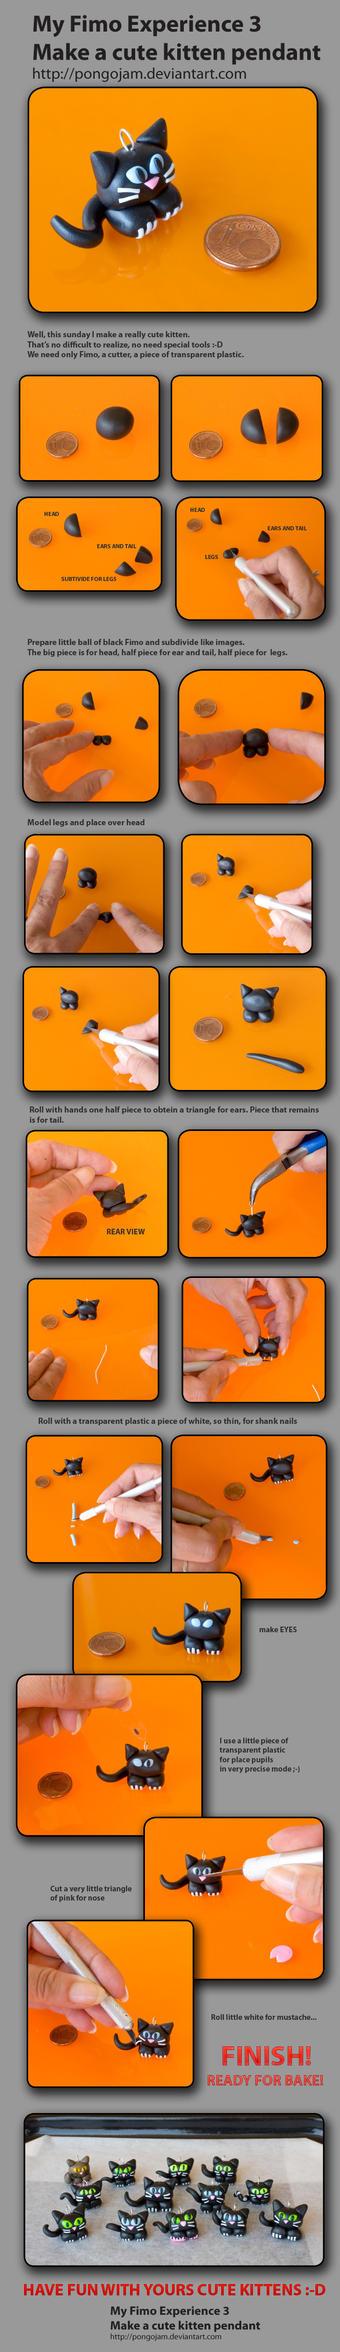 Make cute kitten FIMO TUTORIAL by pongojam